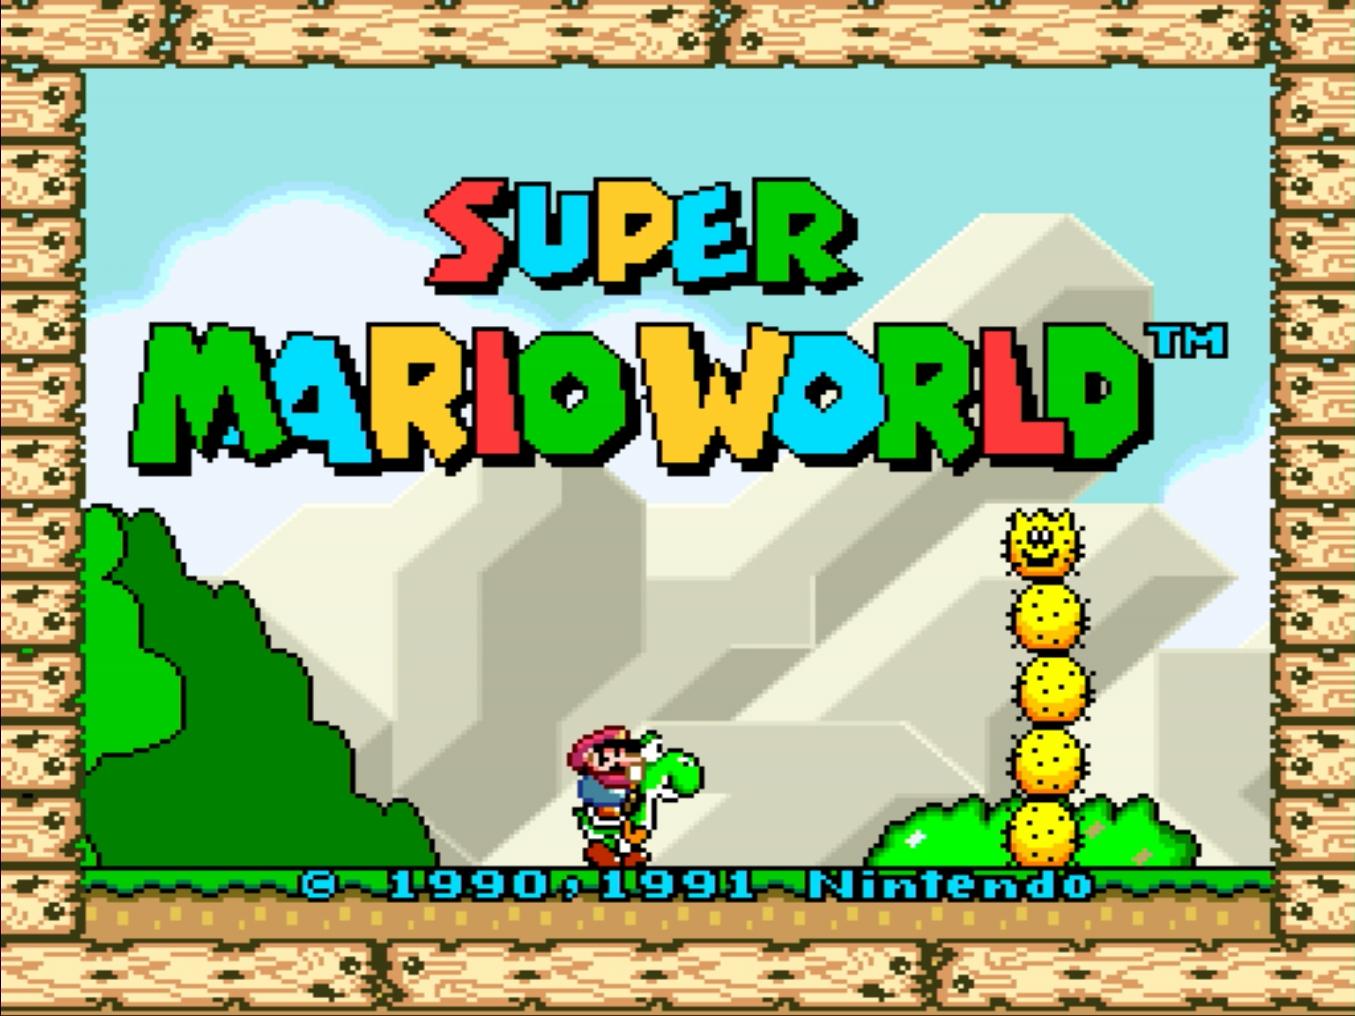 Super Mario World Screenshot (Graphic: Business Wire)